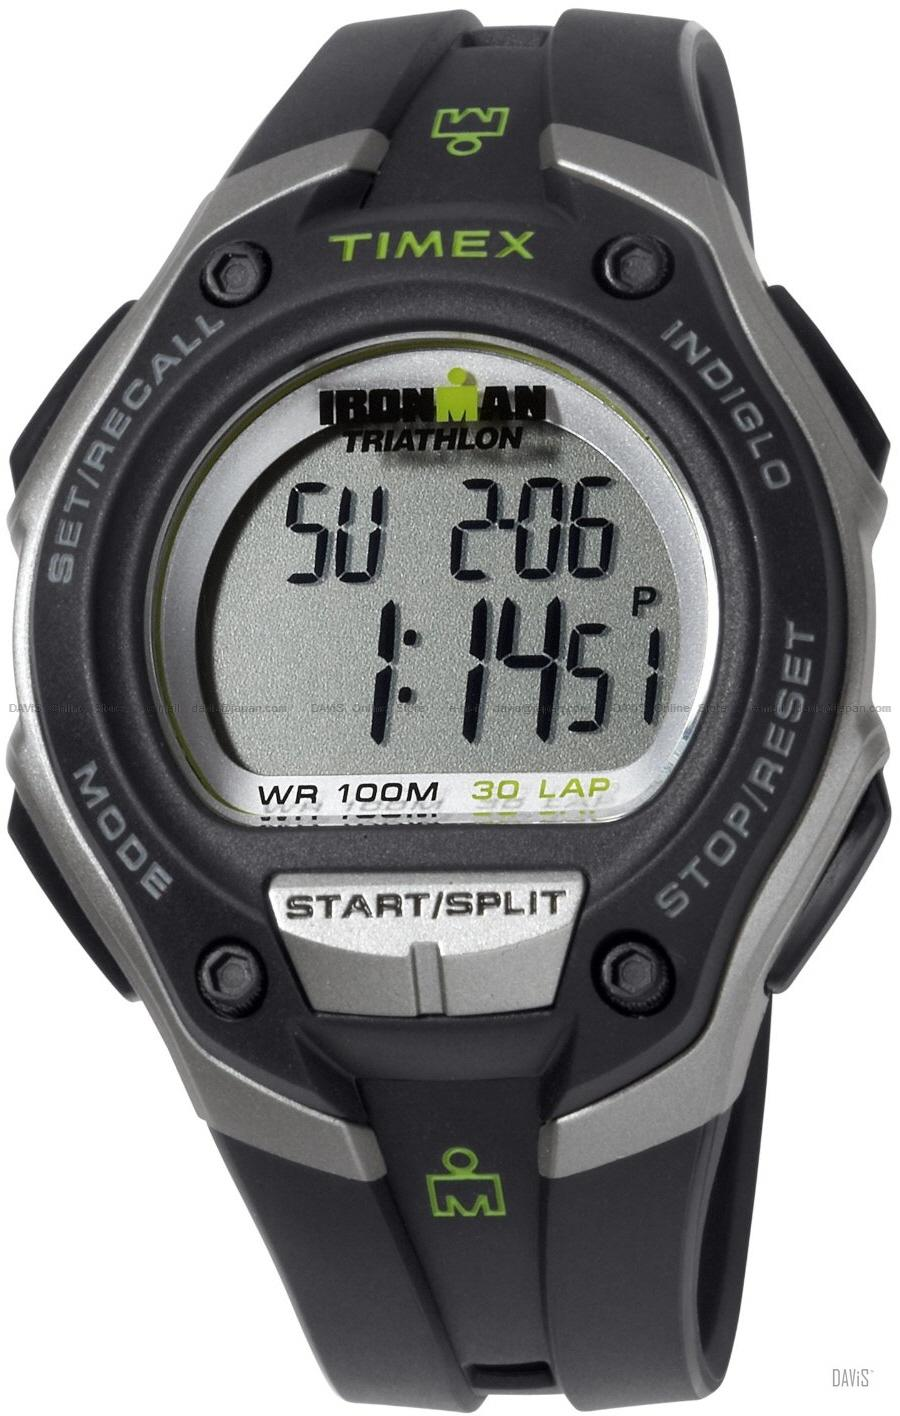 Timex Ironman Triathlon Manual 30 Lap Basic Instruction Manual